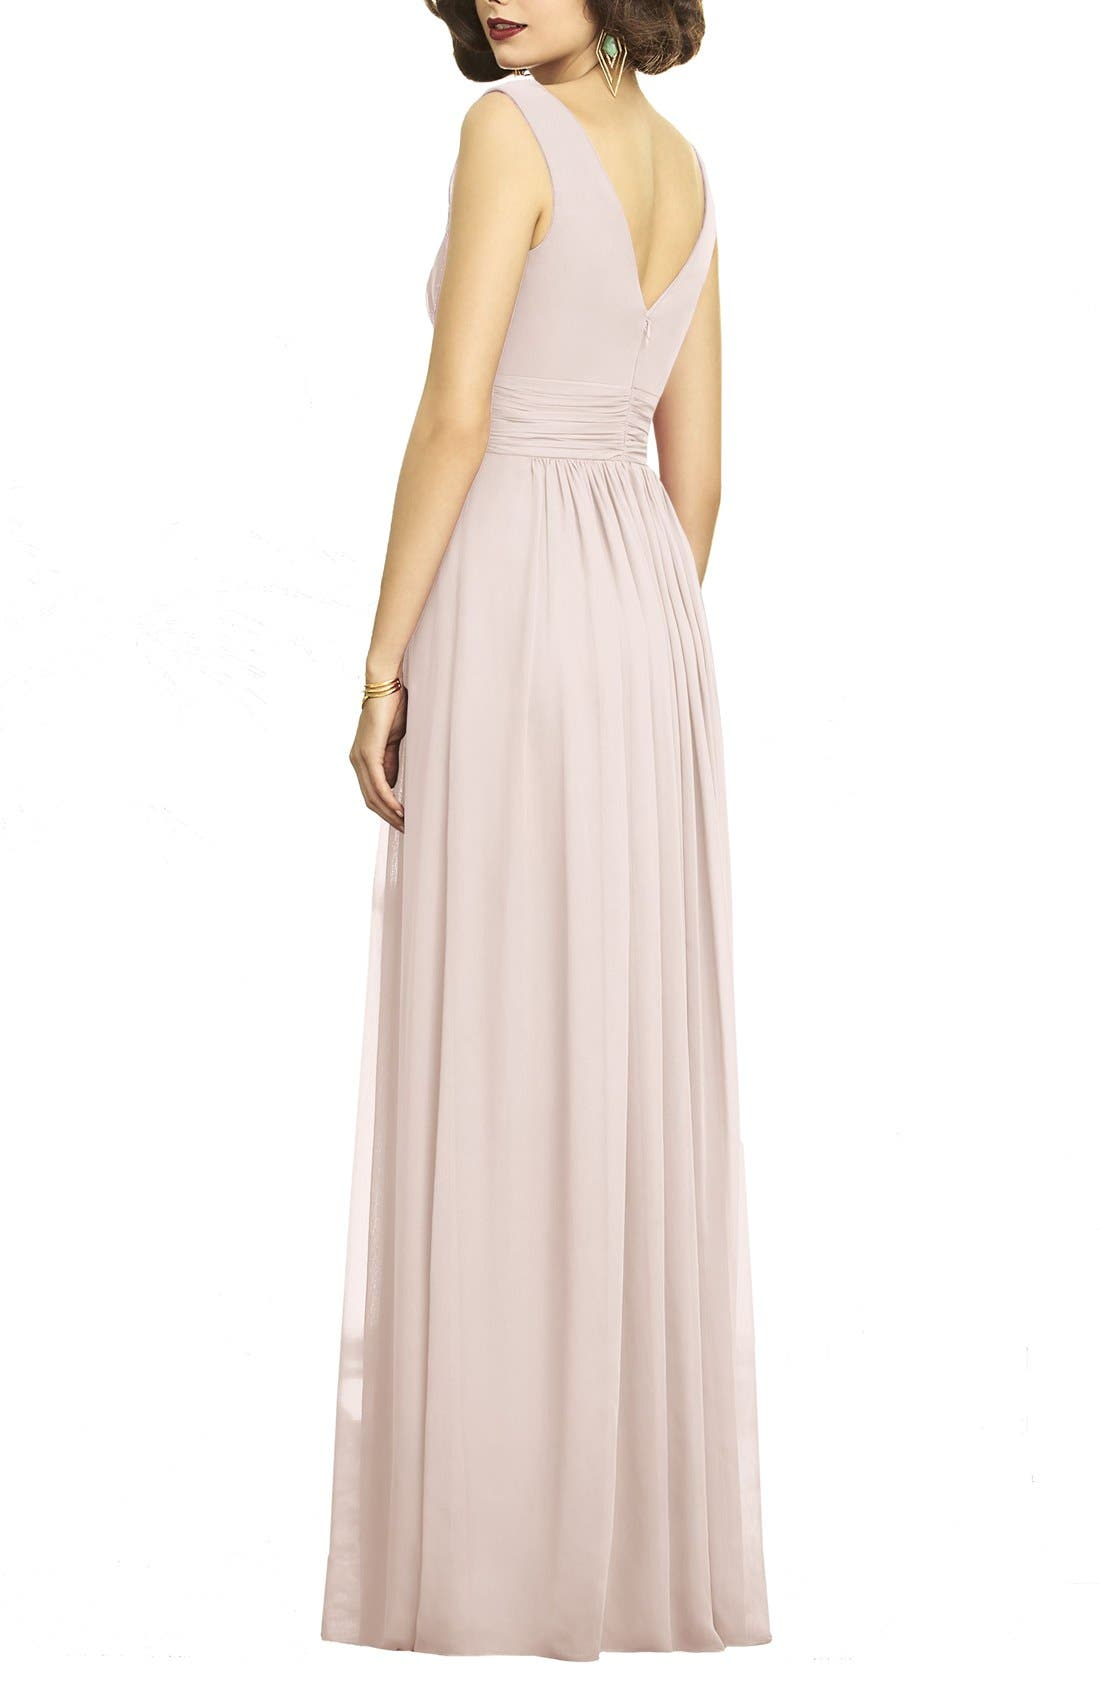 Chiffon bridesmaid wedding party dresses nordstrom ombrellifo Choice Image